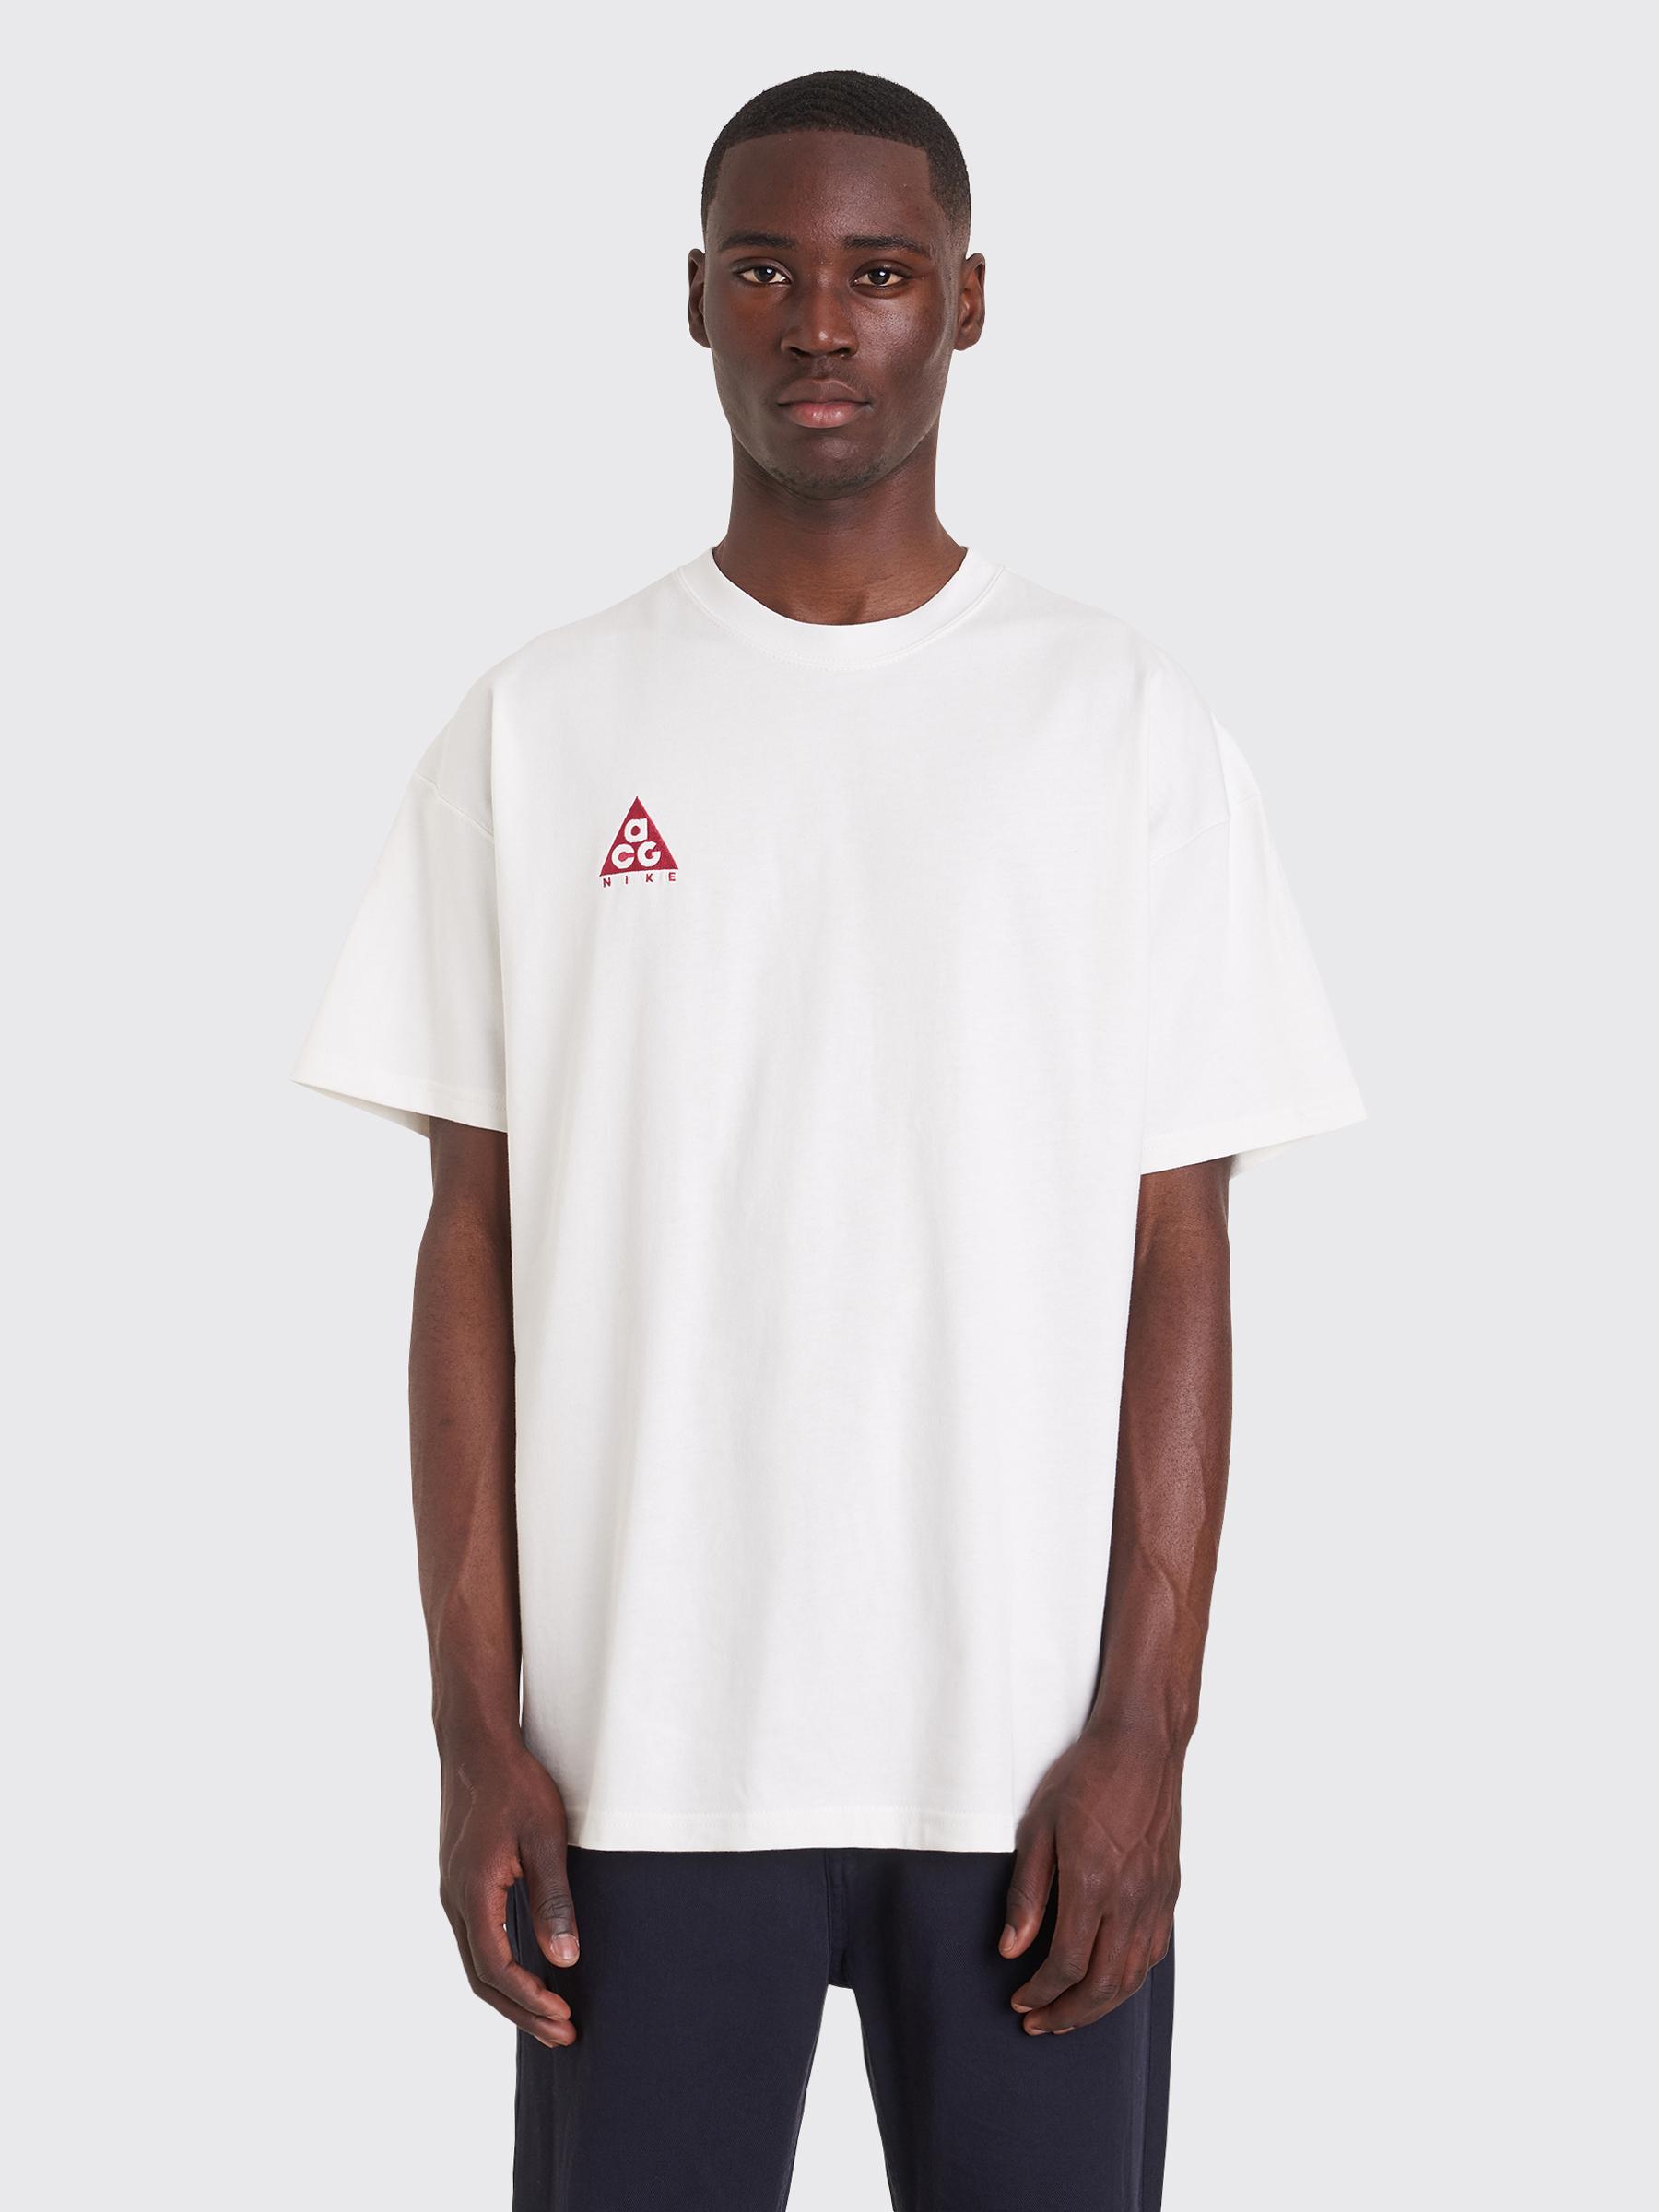 7ab0b8aa Très Bien - Nike ACG NRG Logo Short Sleeve T-shirt White